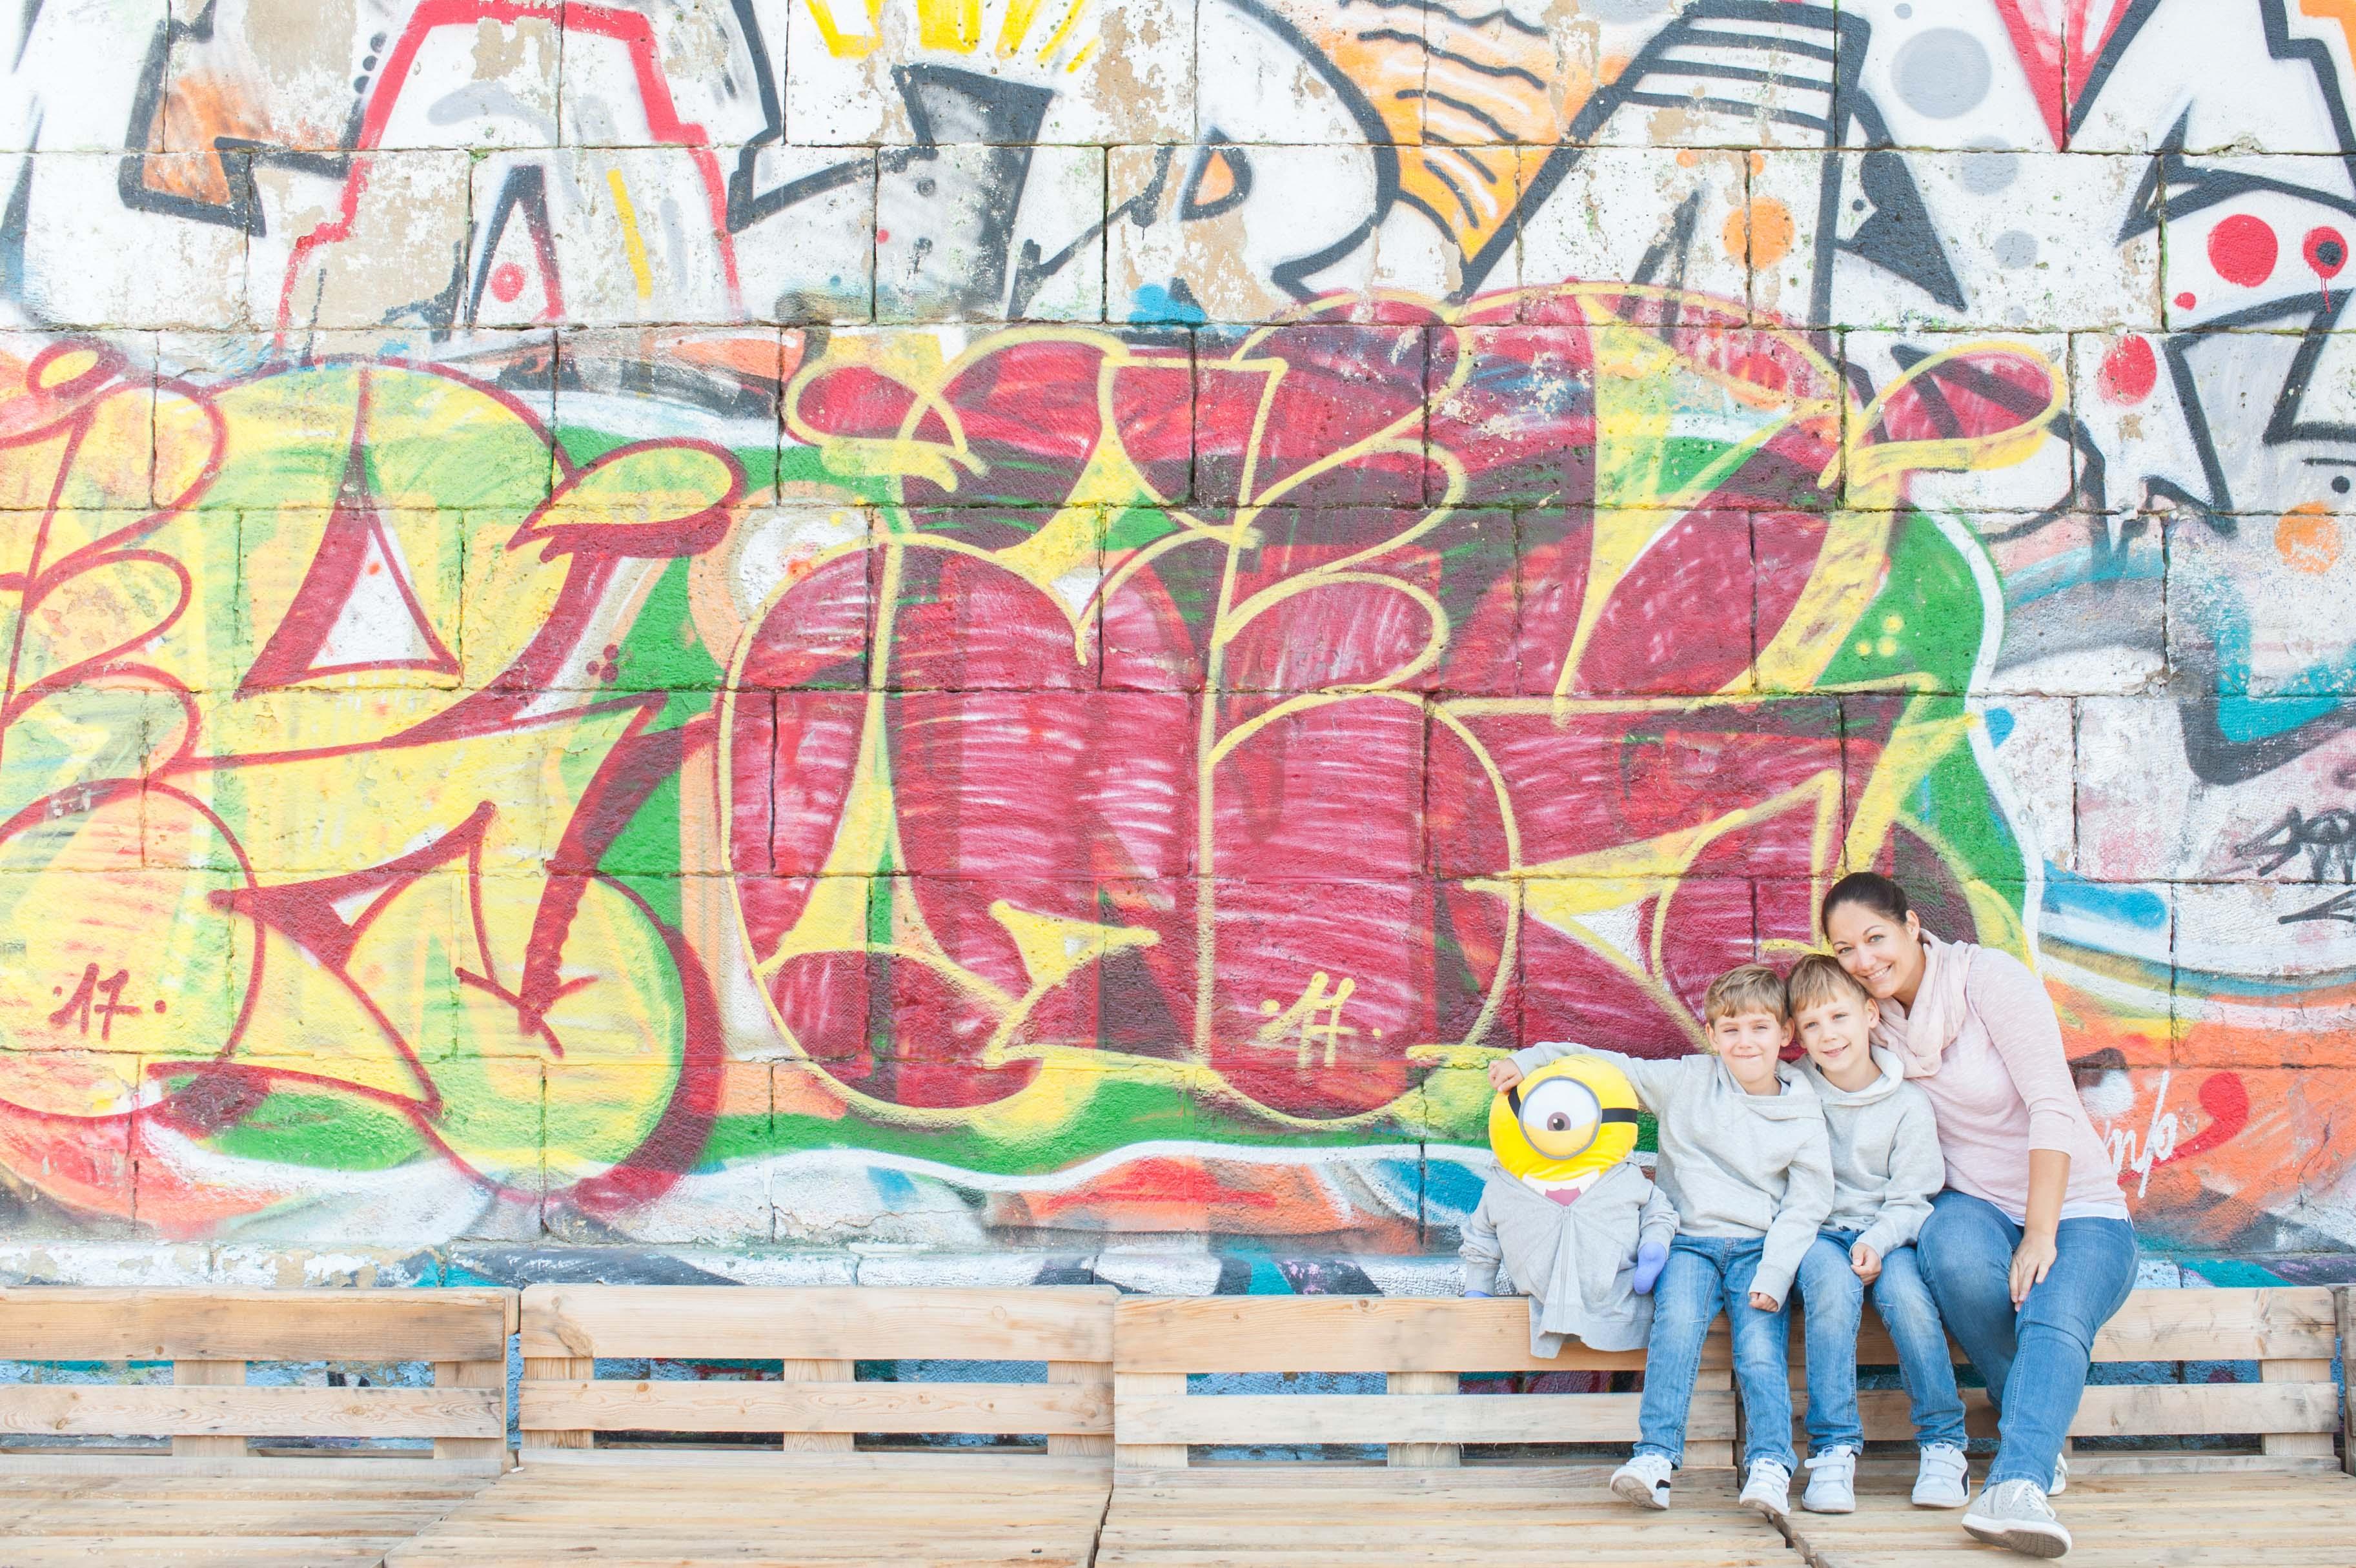 01_2017-09-30_Grafitti-VERKLEINERT-0572